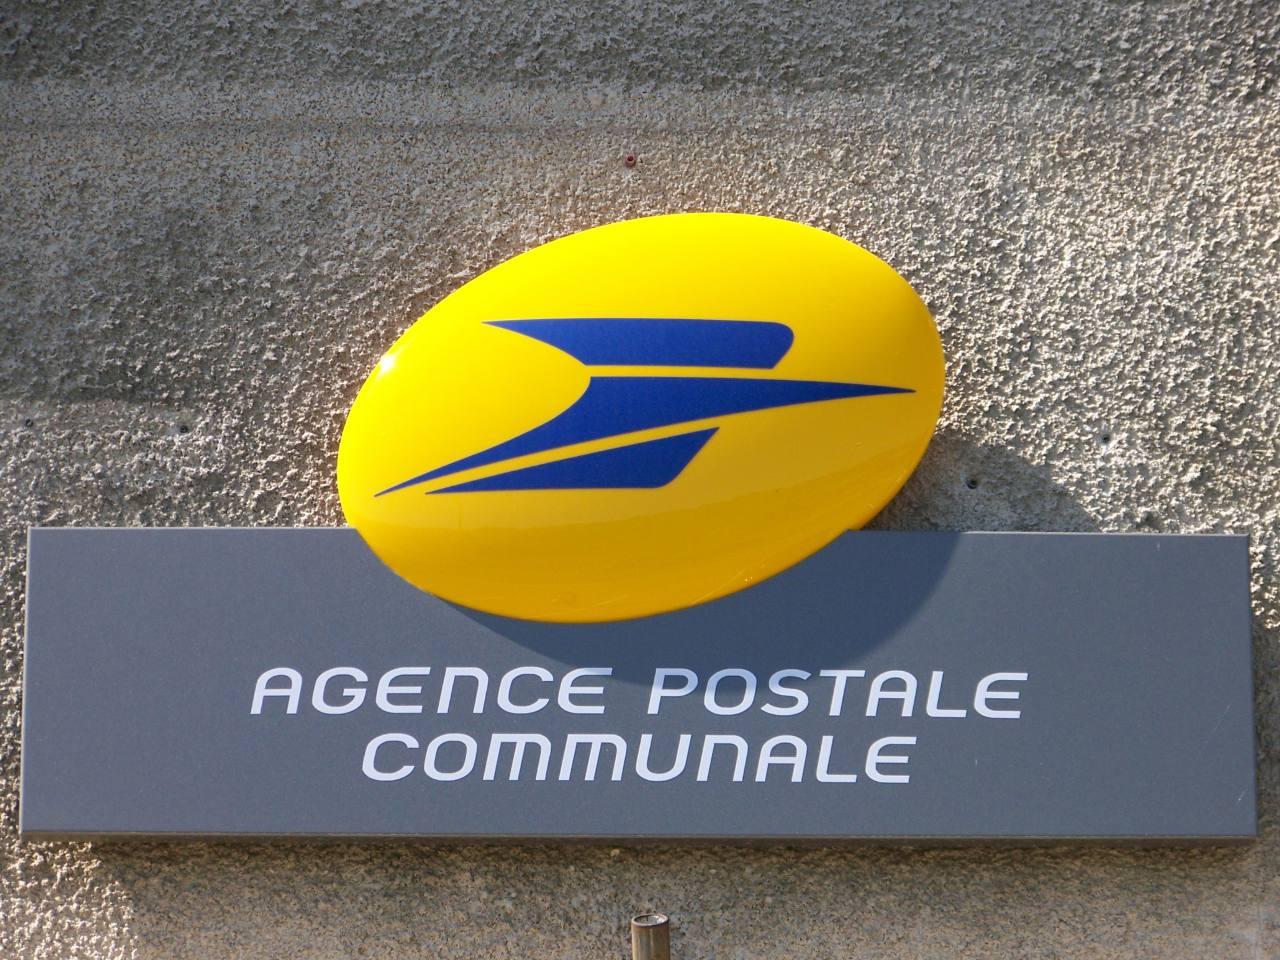 agence-postale-communale